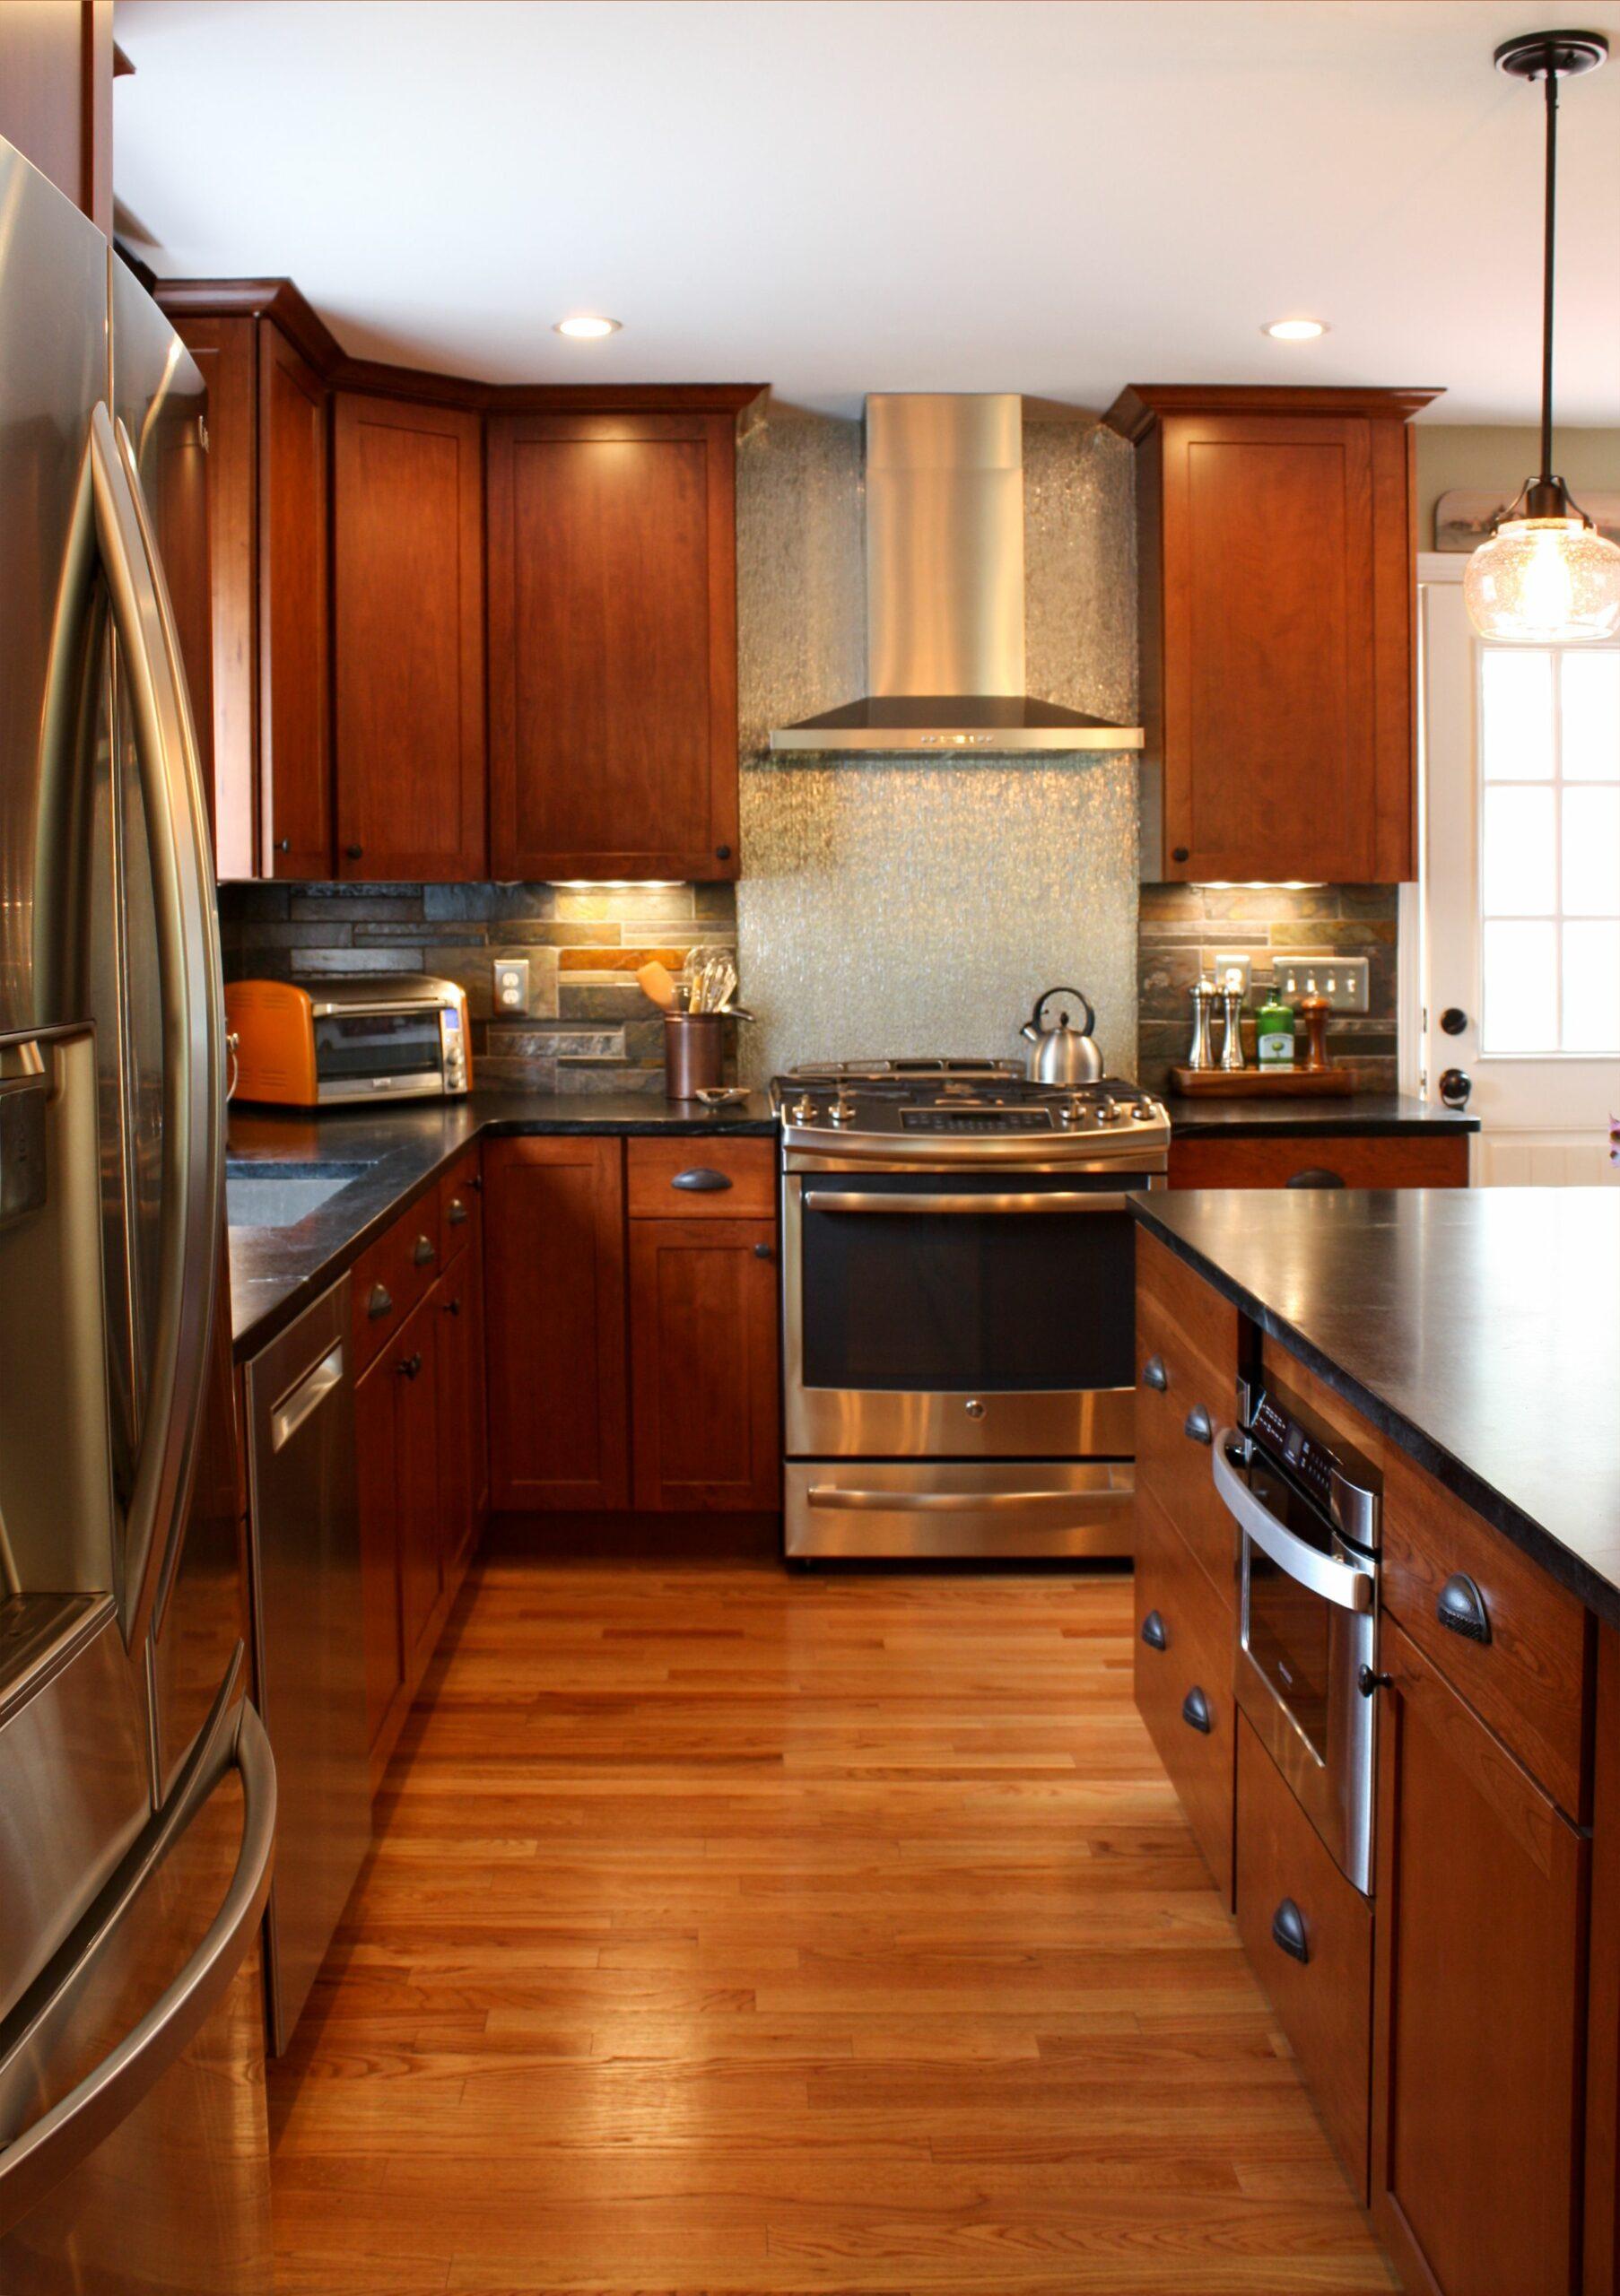 Modern Kitchen Stainless Steel Countertops